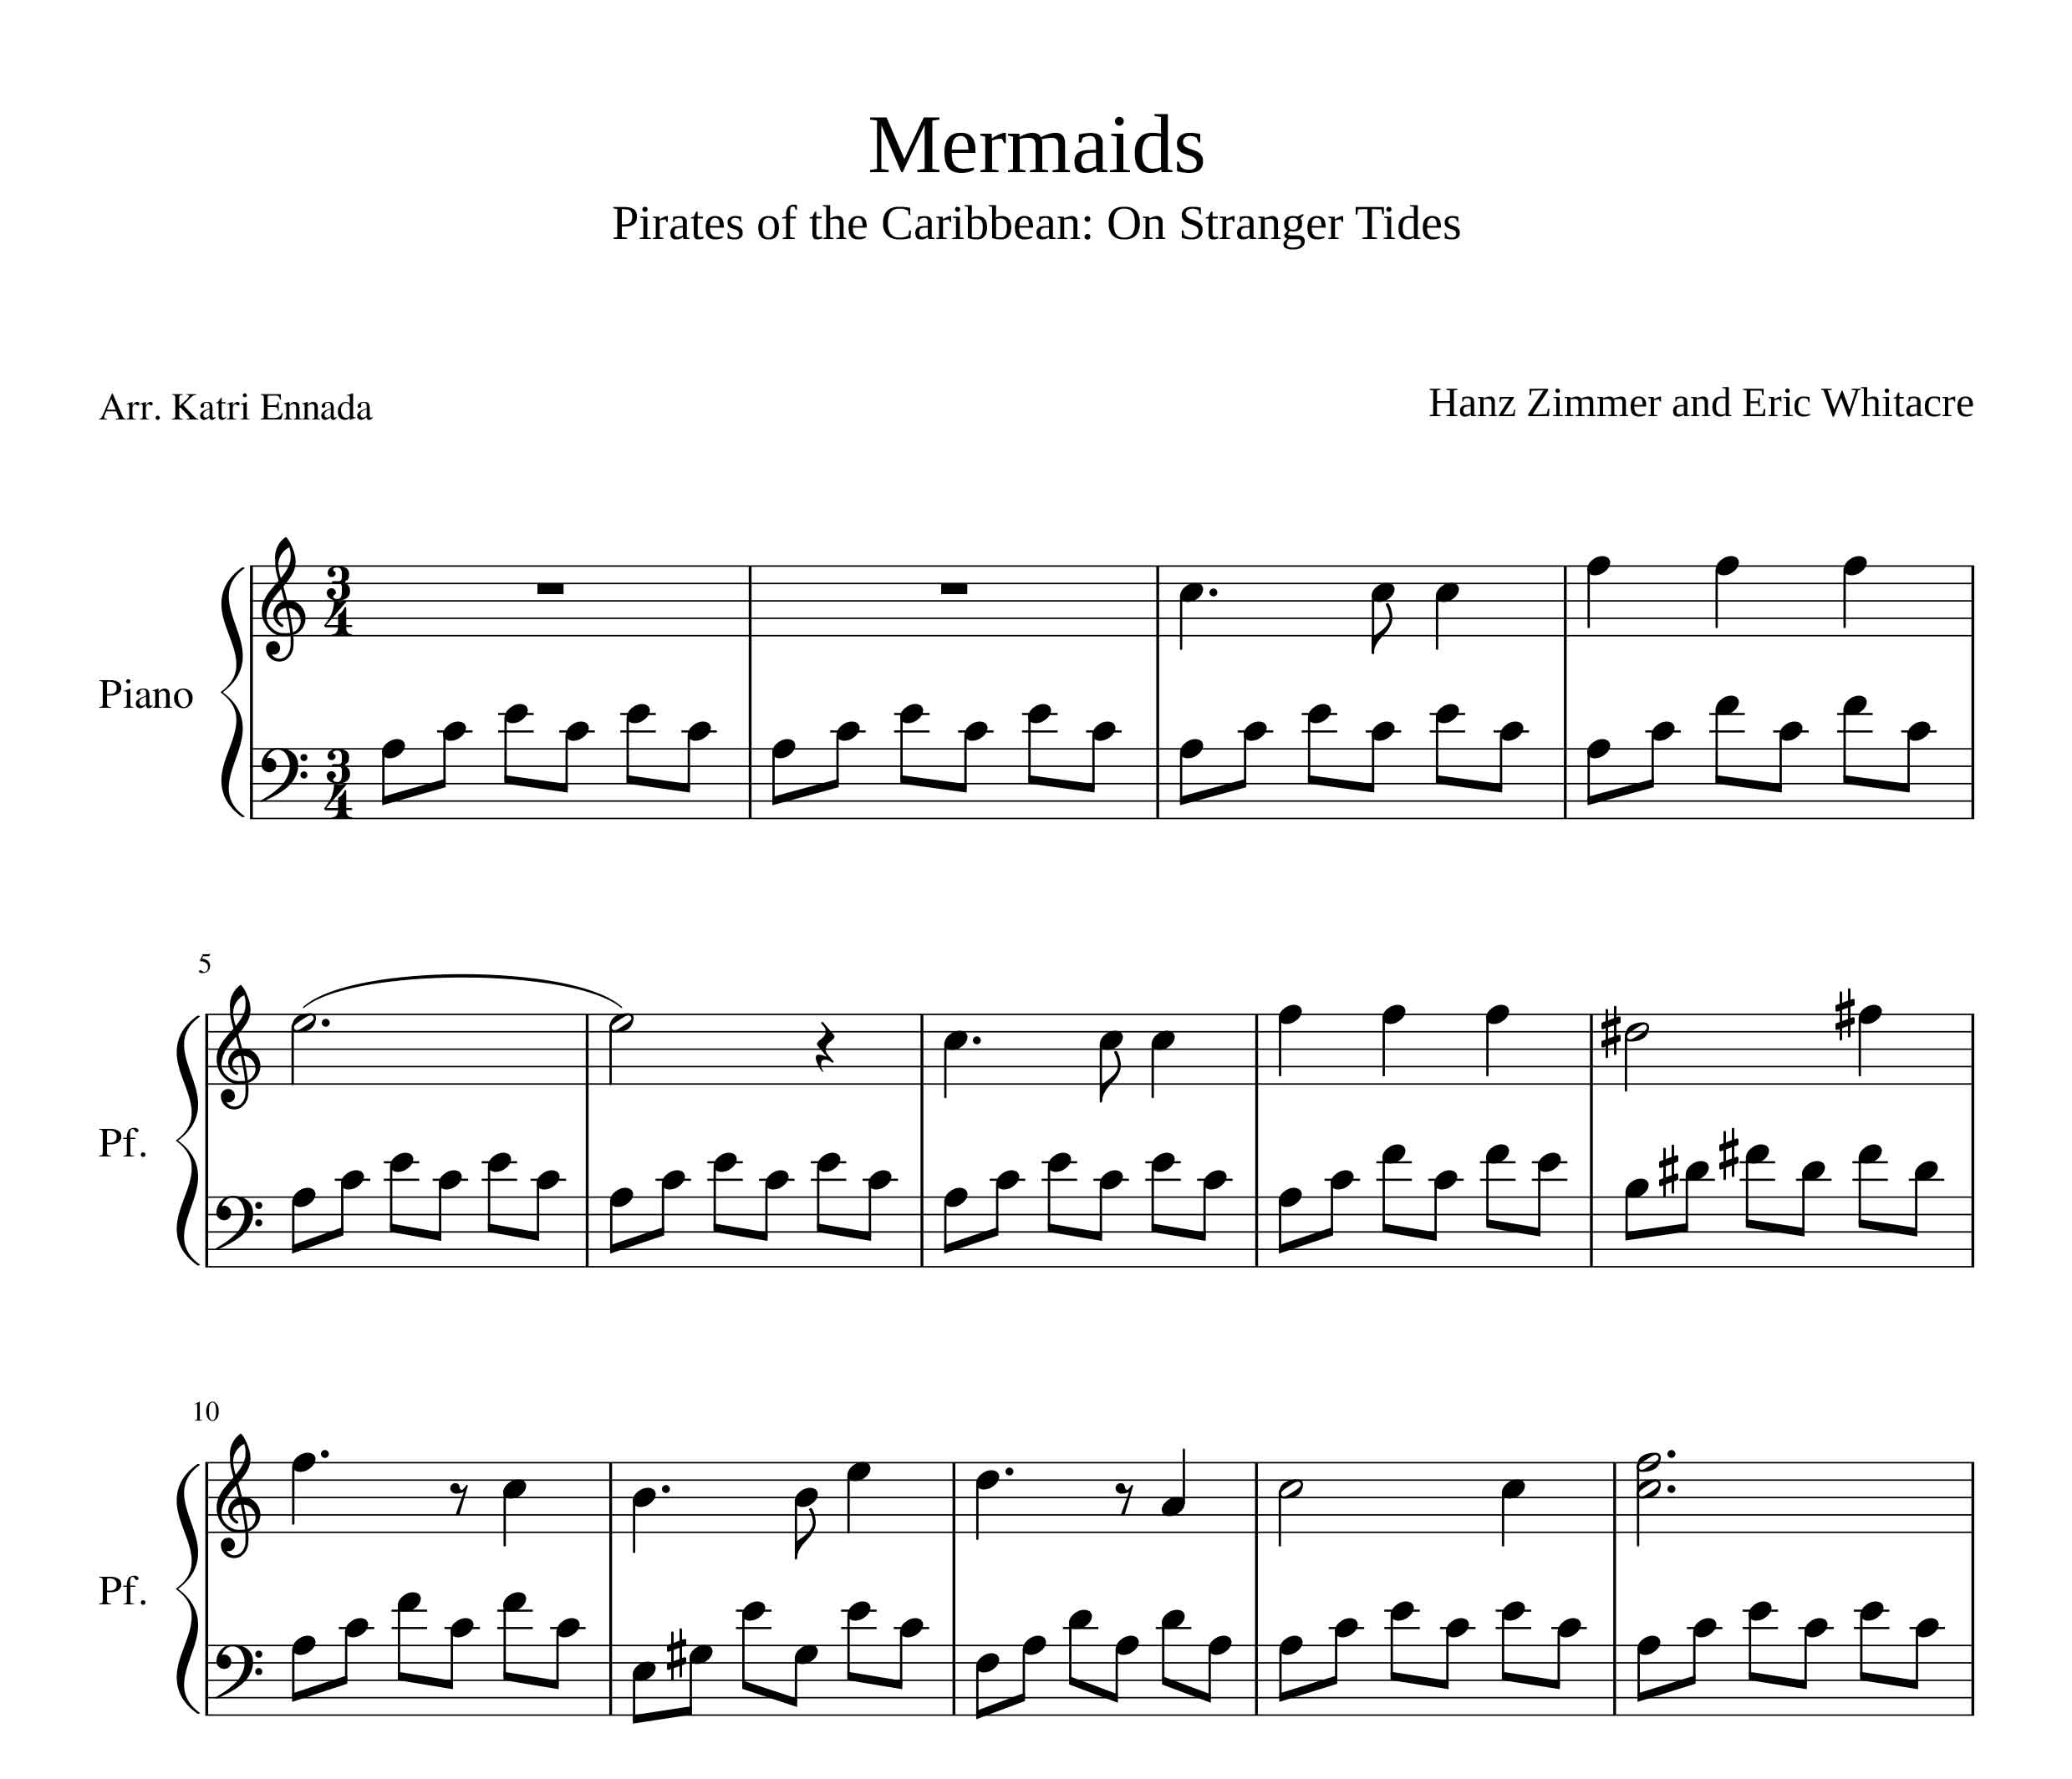 نت پیانوی Mermaids اثر هانس زیمر